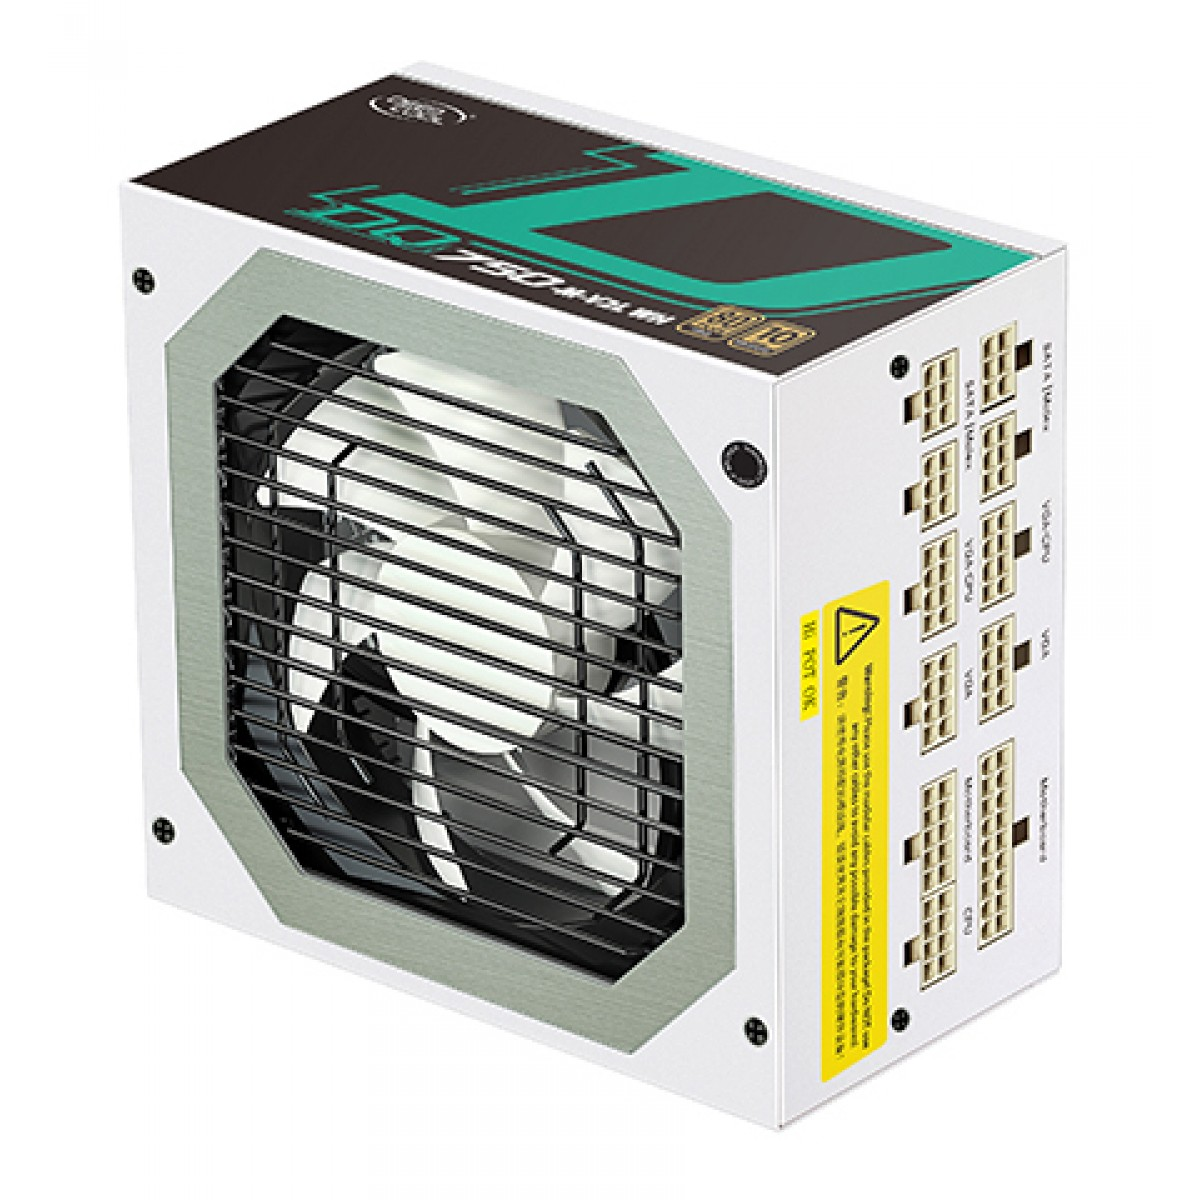 Fonte DeepCool DQ750, 750W, 80 Plus Gold, PFC Ativo, White, Full Modular, DP-DQ750-M-V2L-WH